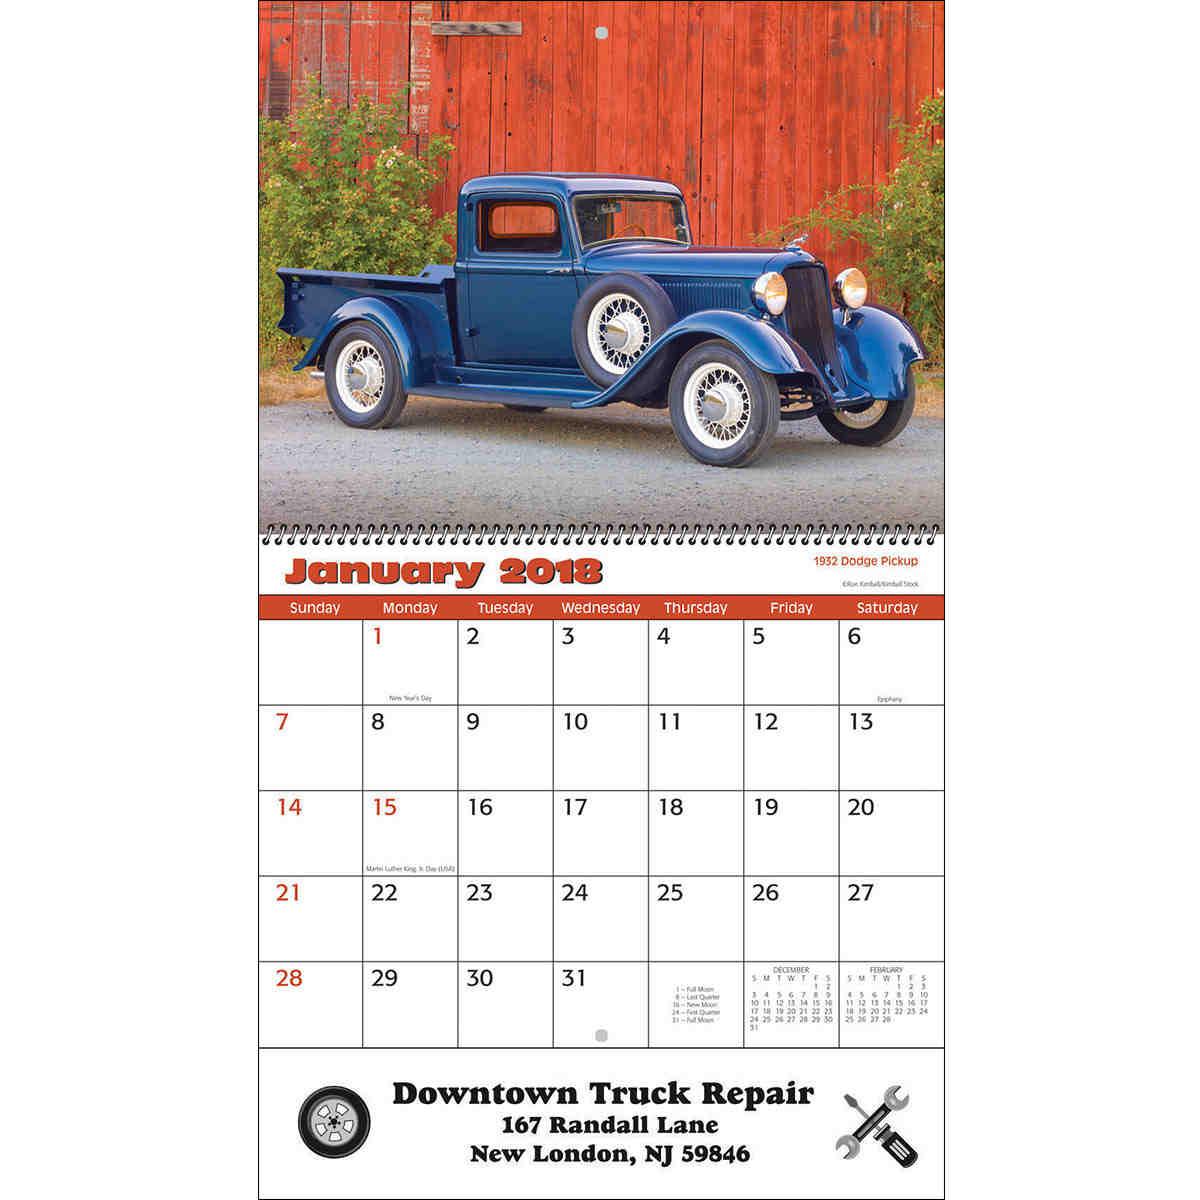 goingreen(R) Monthly Pocket Planner Promotional Calendar 2015